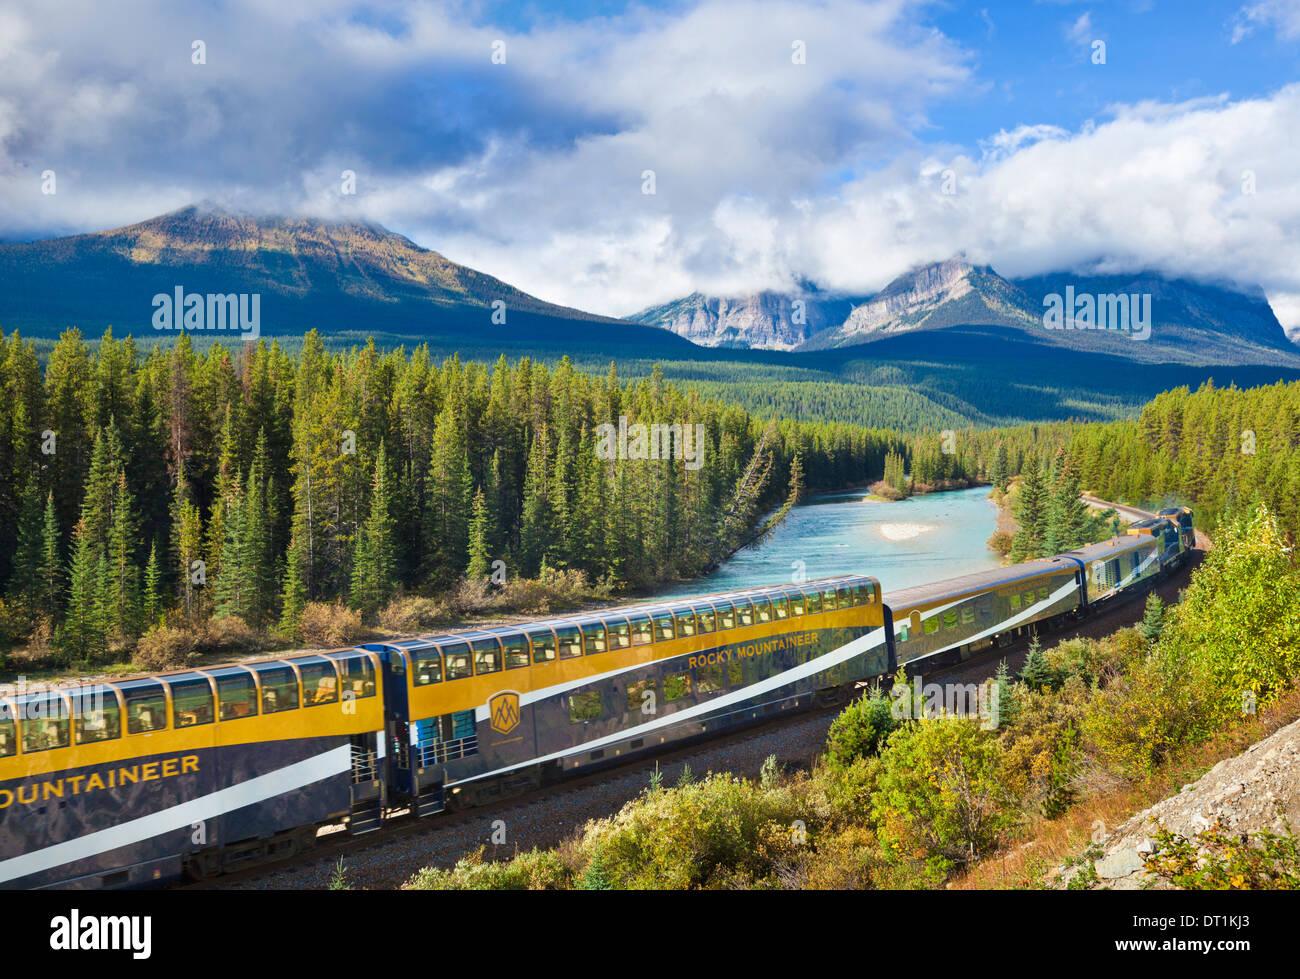 Rocky Mountaineer Zug am Morant Kurve in die kanadischen Rocky Mountains, Banff National Park, der UNESCO, Alberta Kanada Stockbild